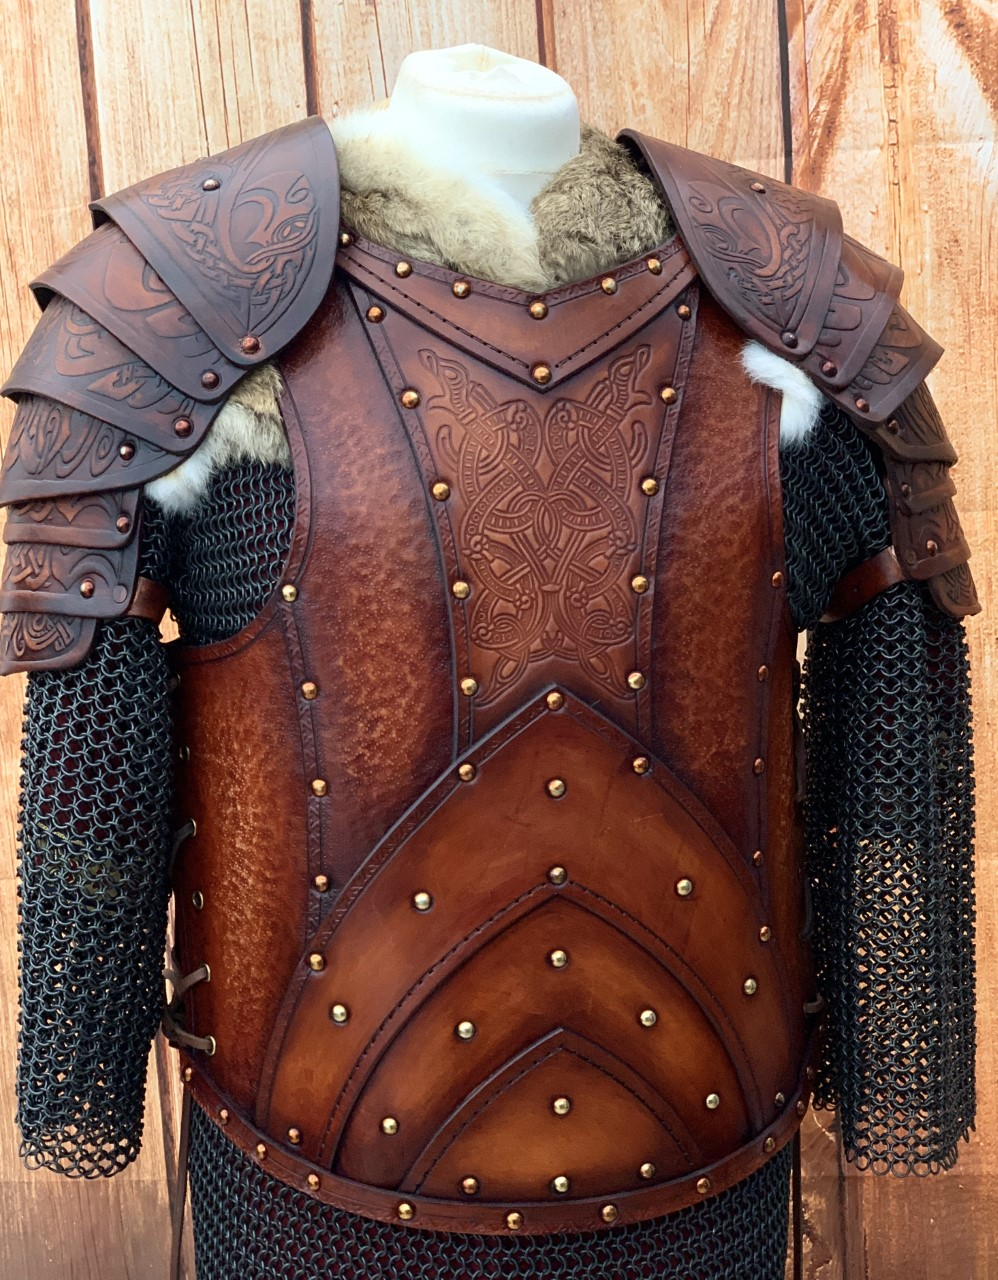 Jörmungandr with shoulders